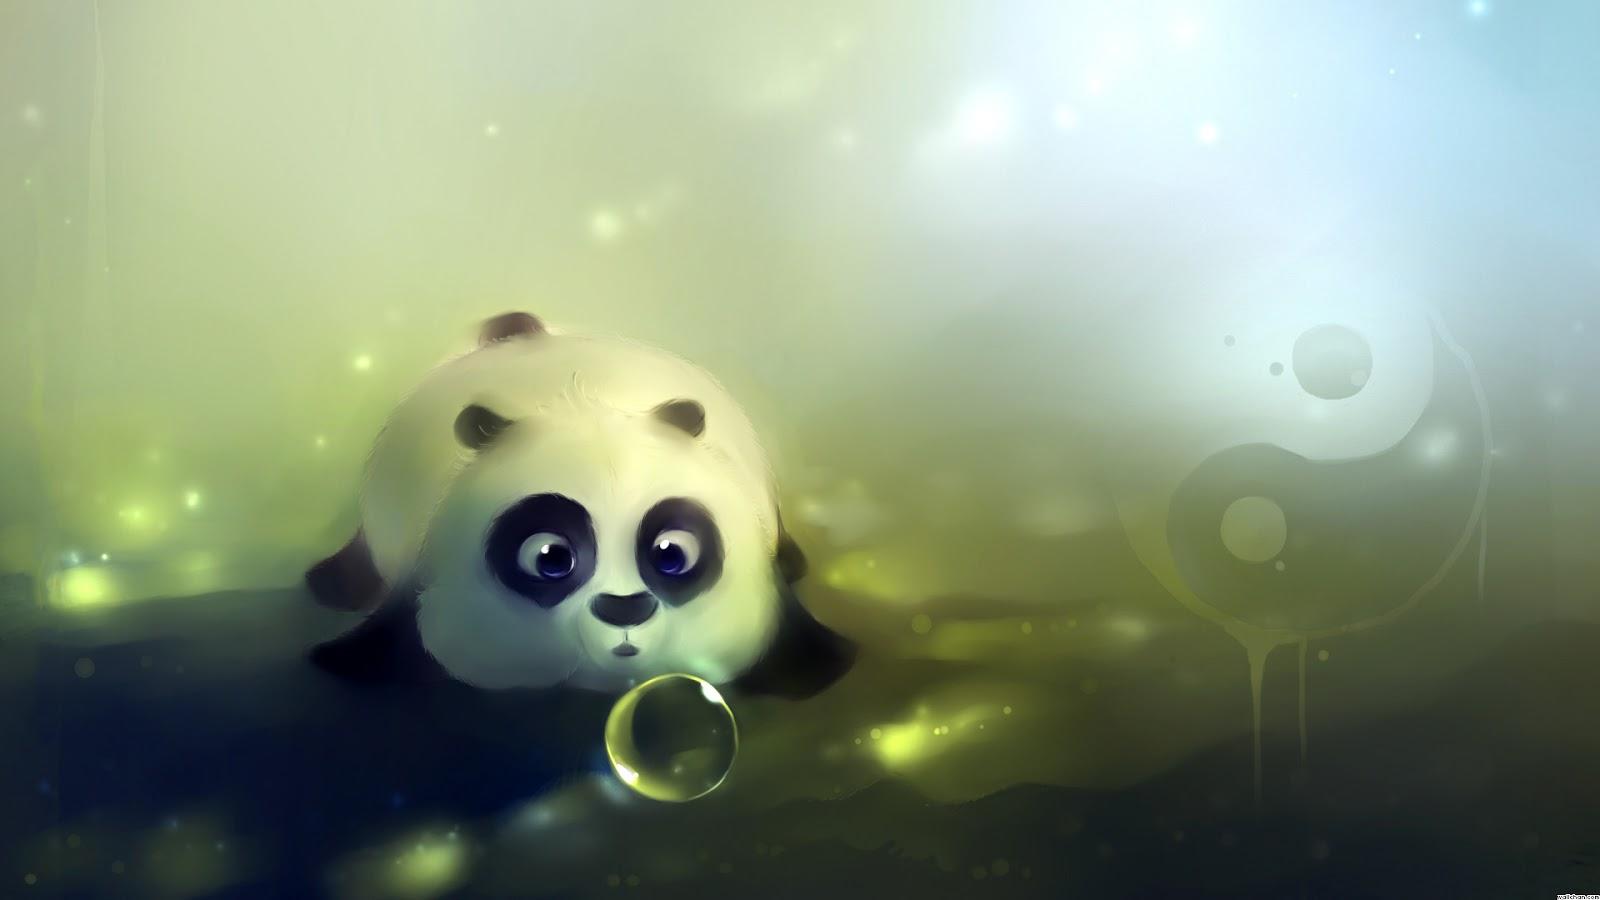 50 4k Panda Wallpapers Hd For Desktop 1440p 2020 Page 2 Of 2 We 7